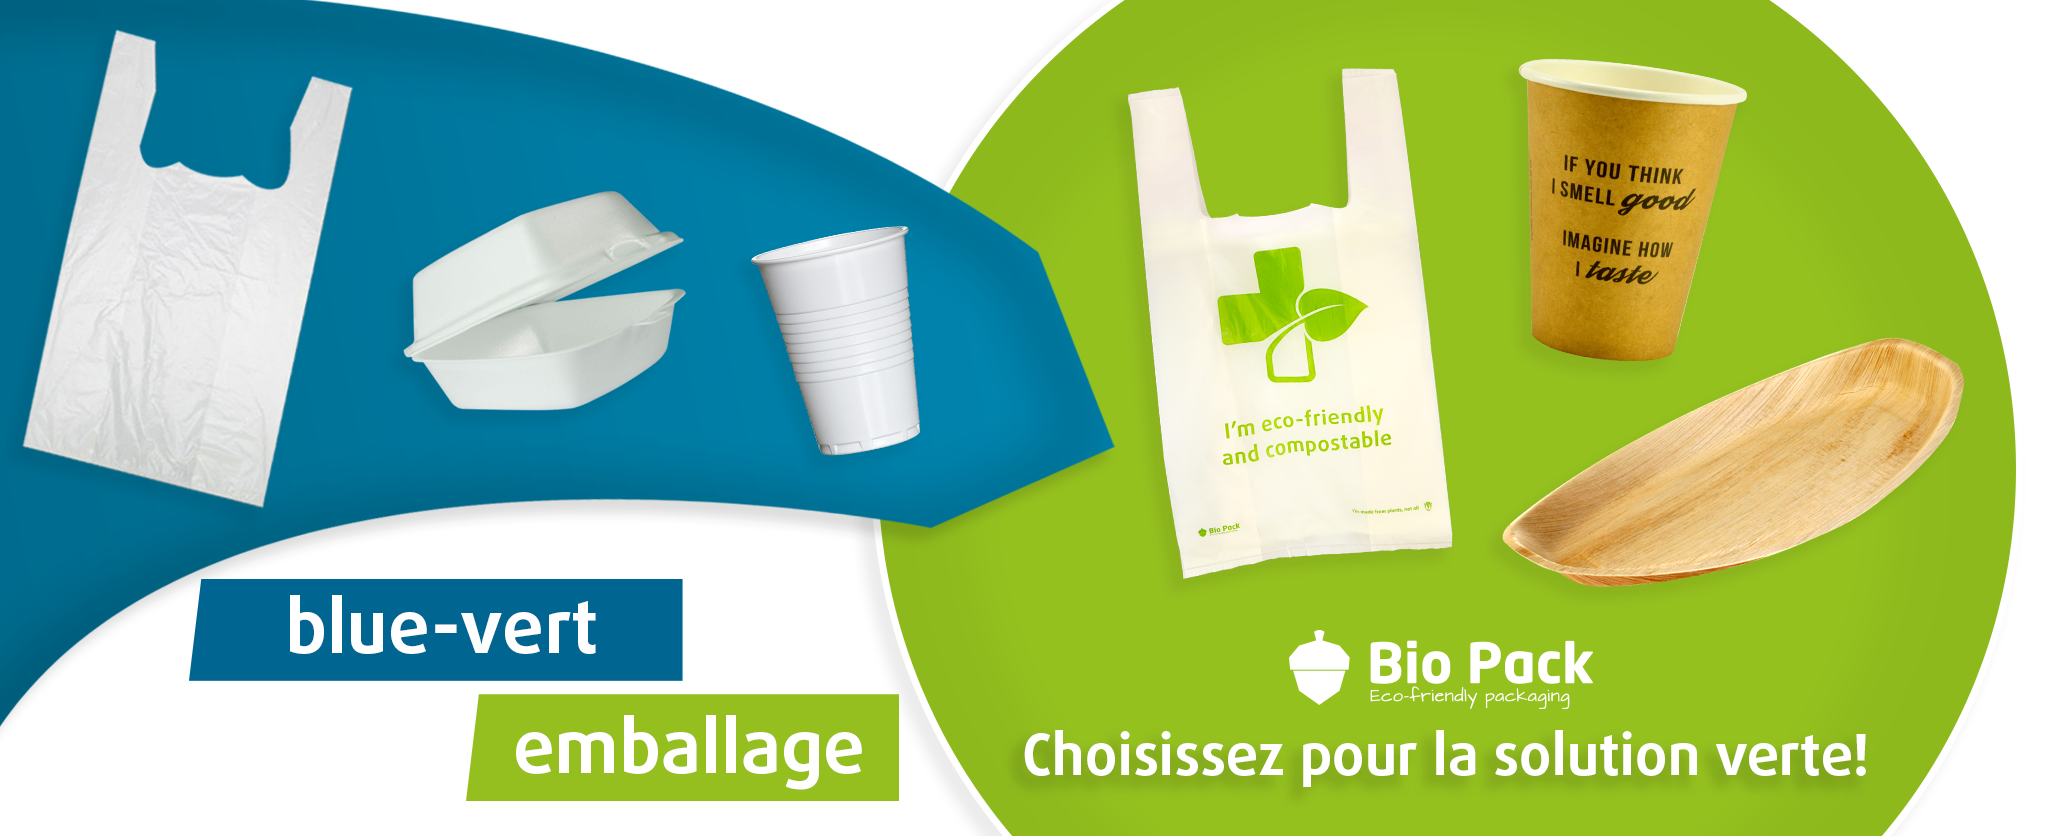 emballage blue-vert